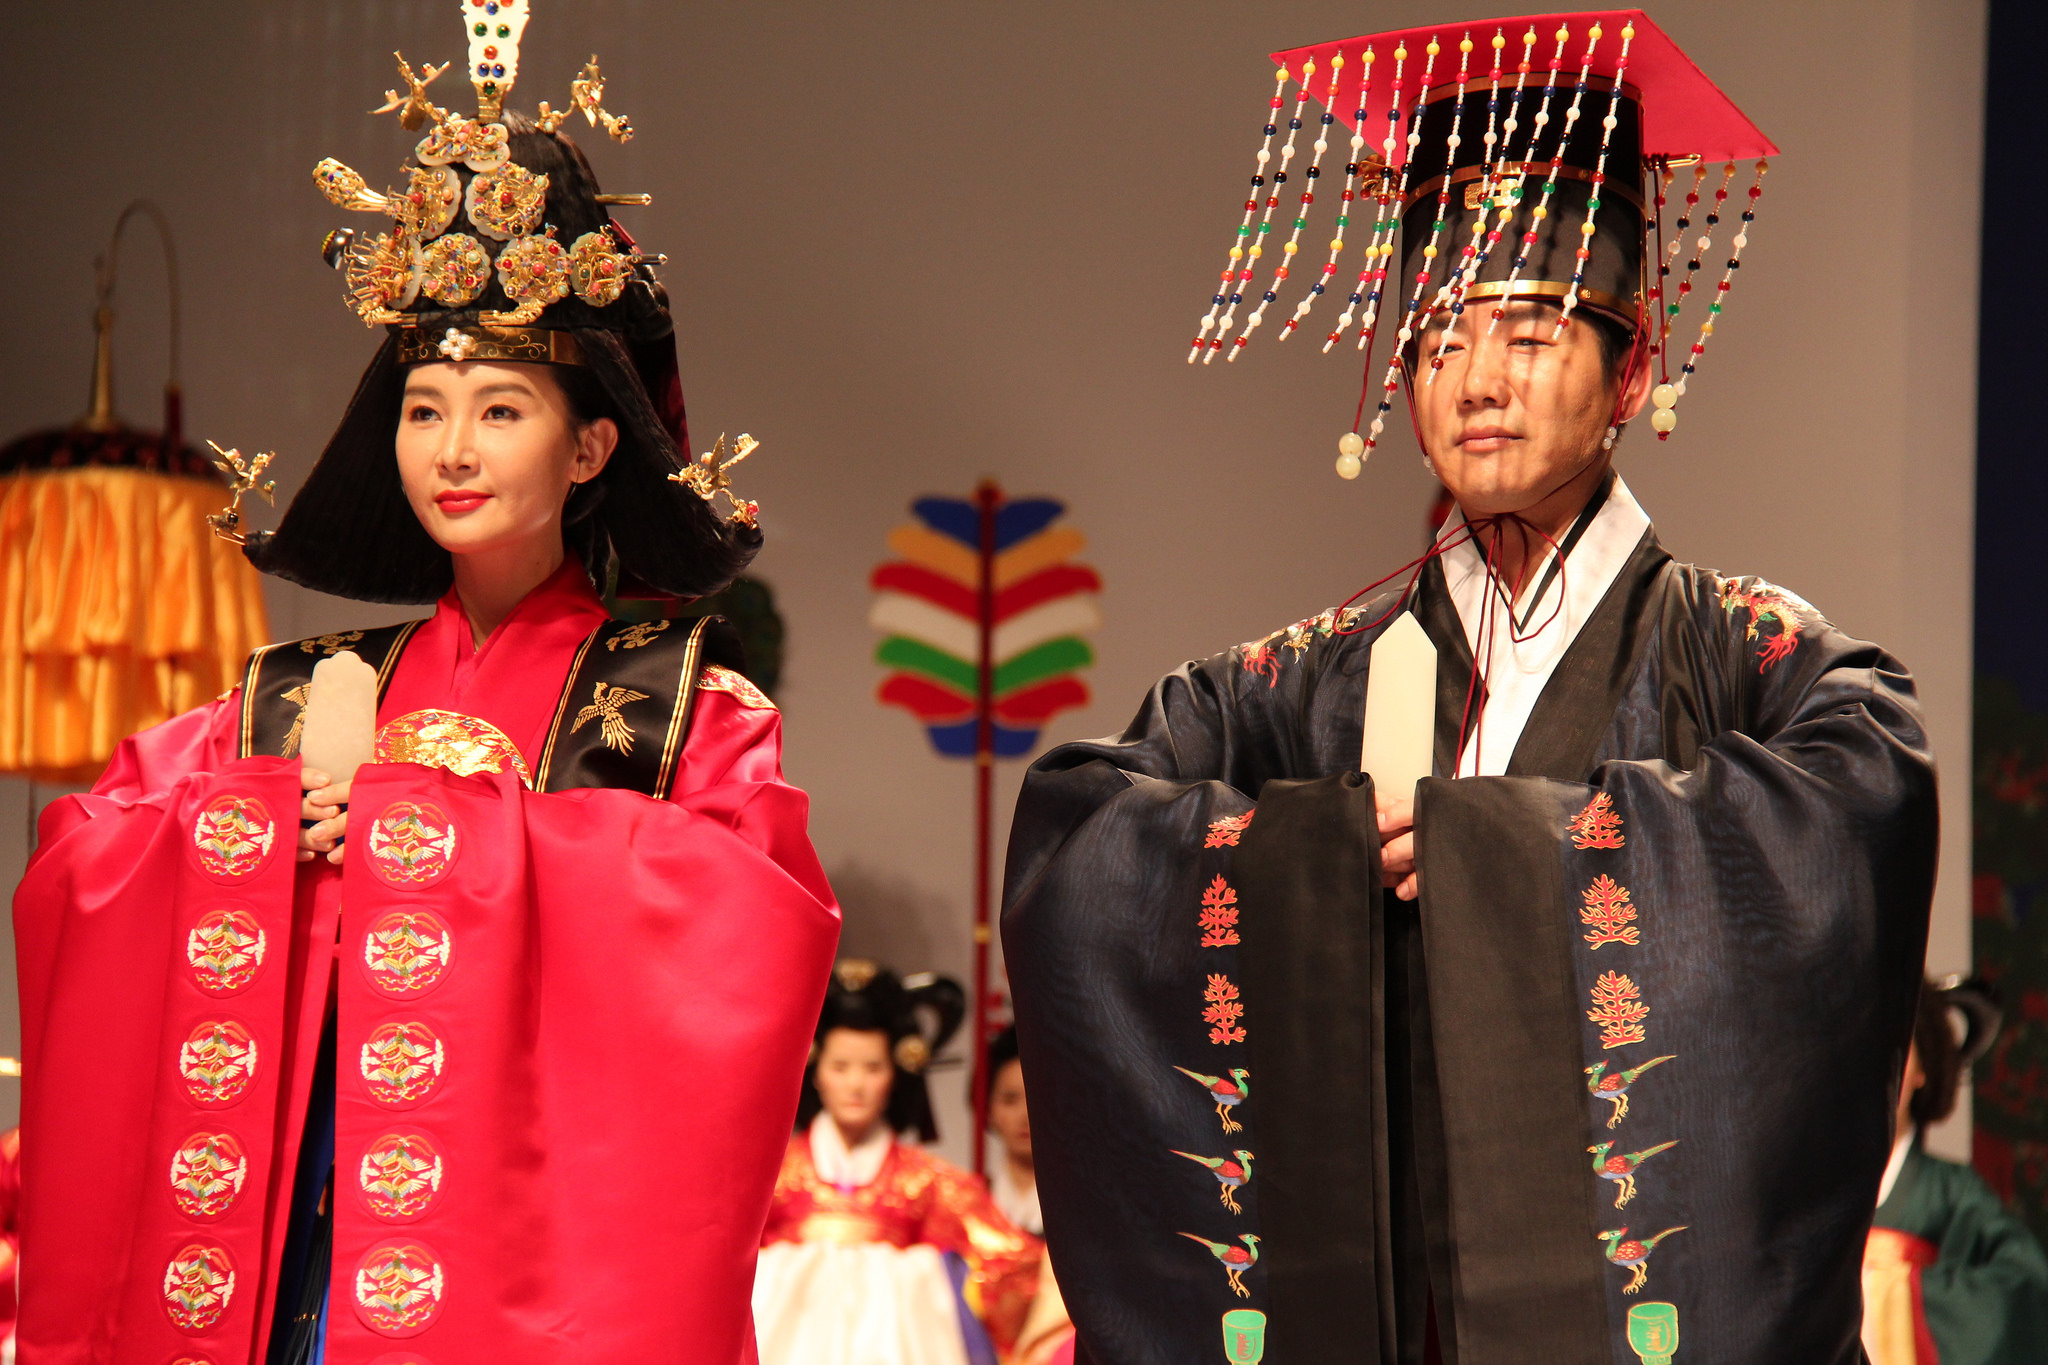 1483a01db4bd1 Hanbok: An Introduction to South Korea's National Dress